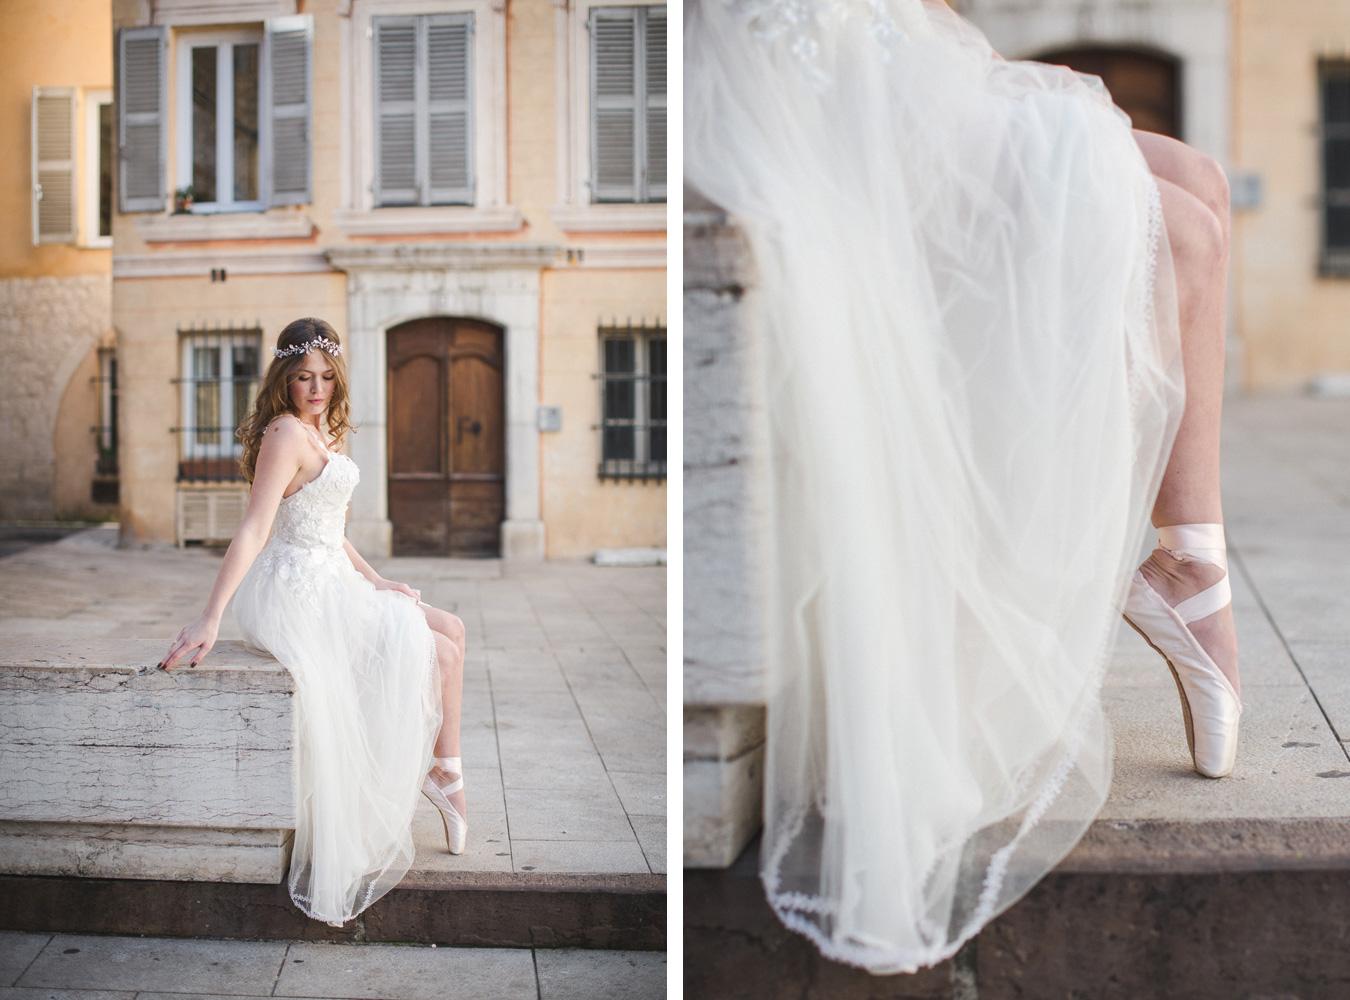 007-fotograf-tone-tvedt-bryllup-i-utlandet.jpg